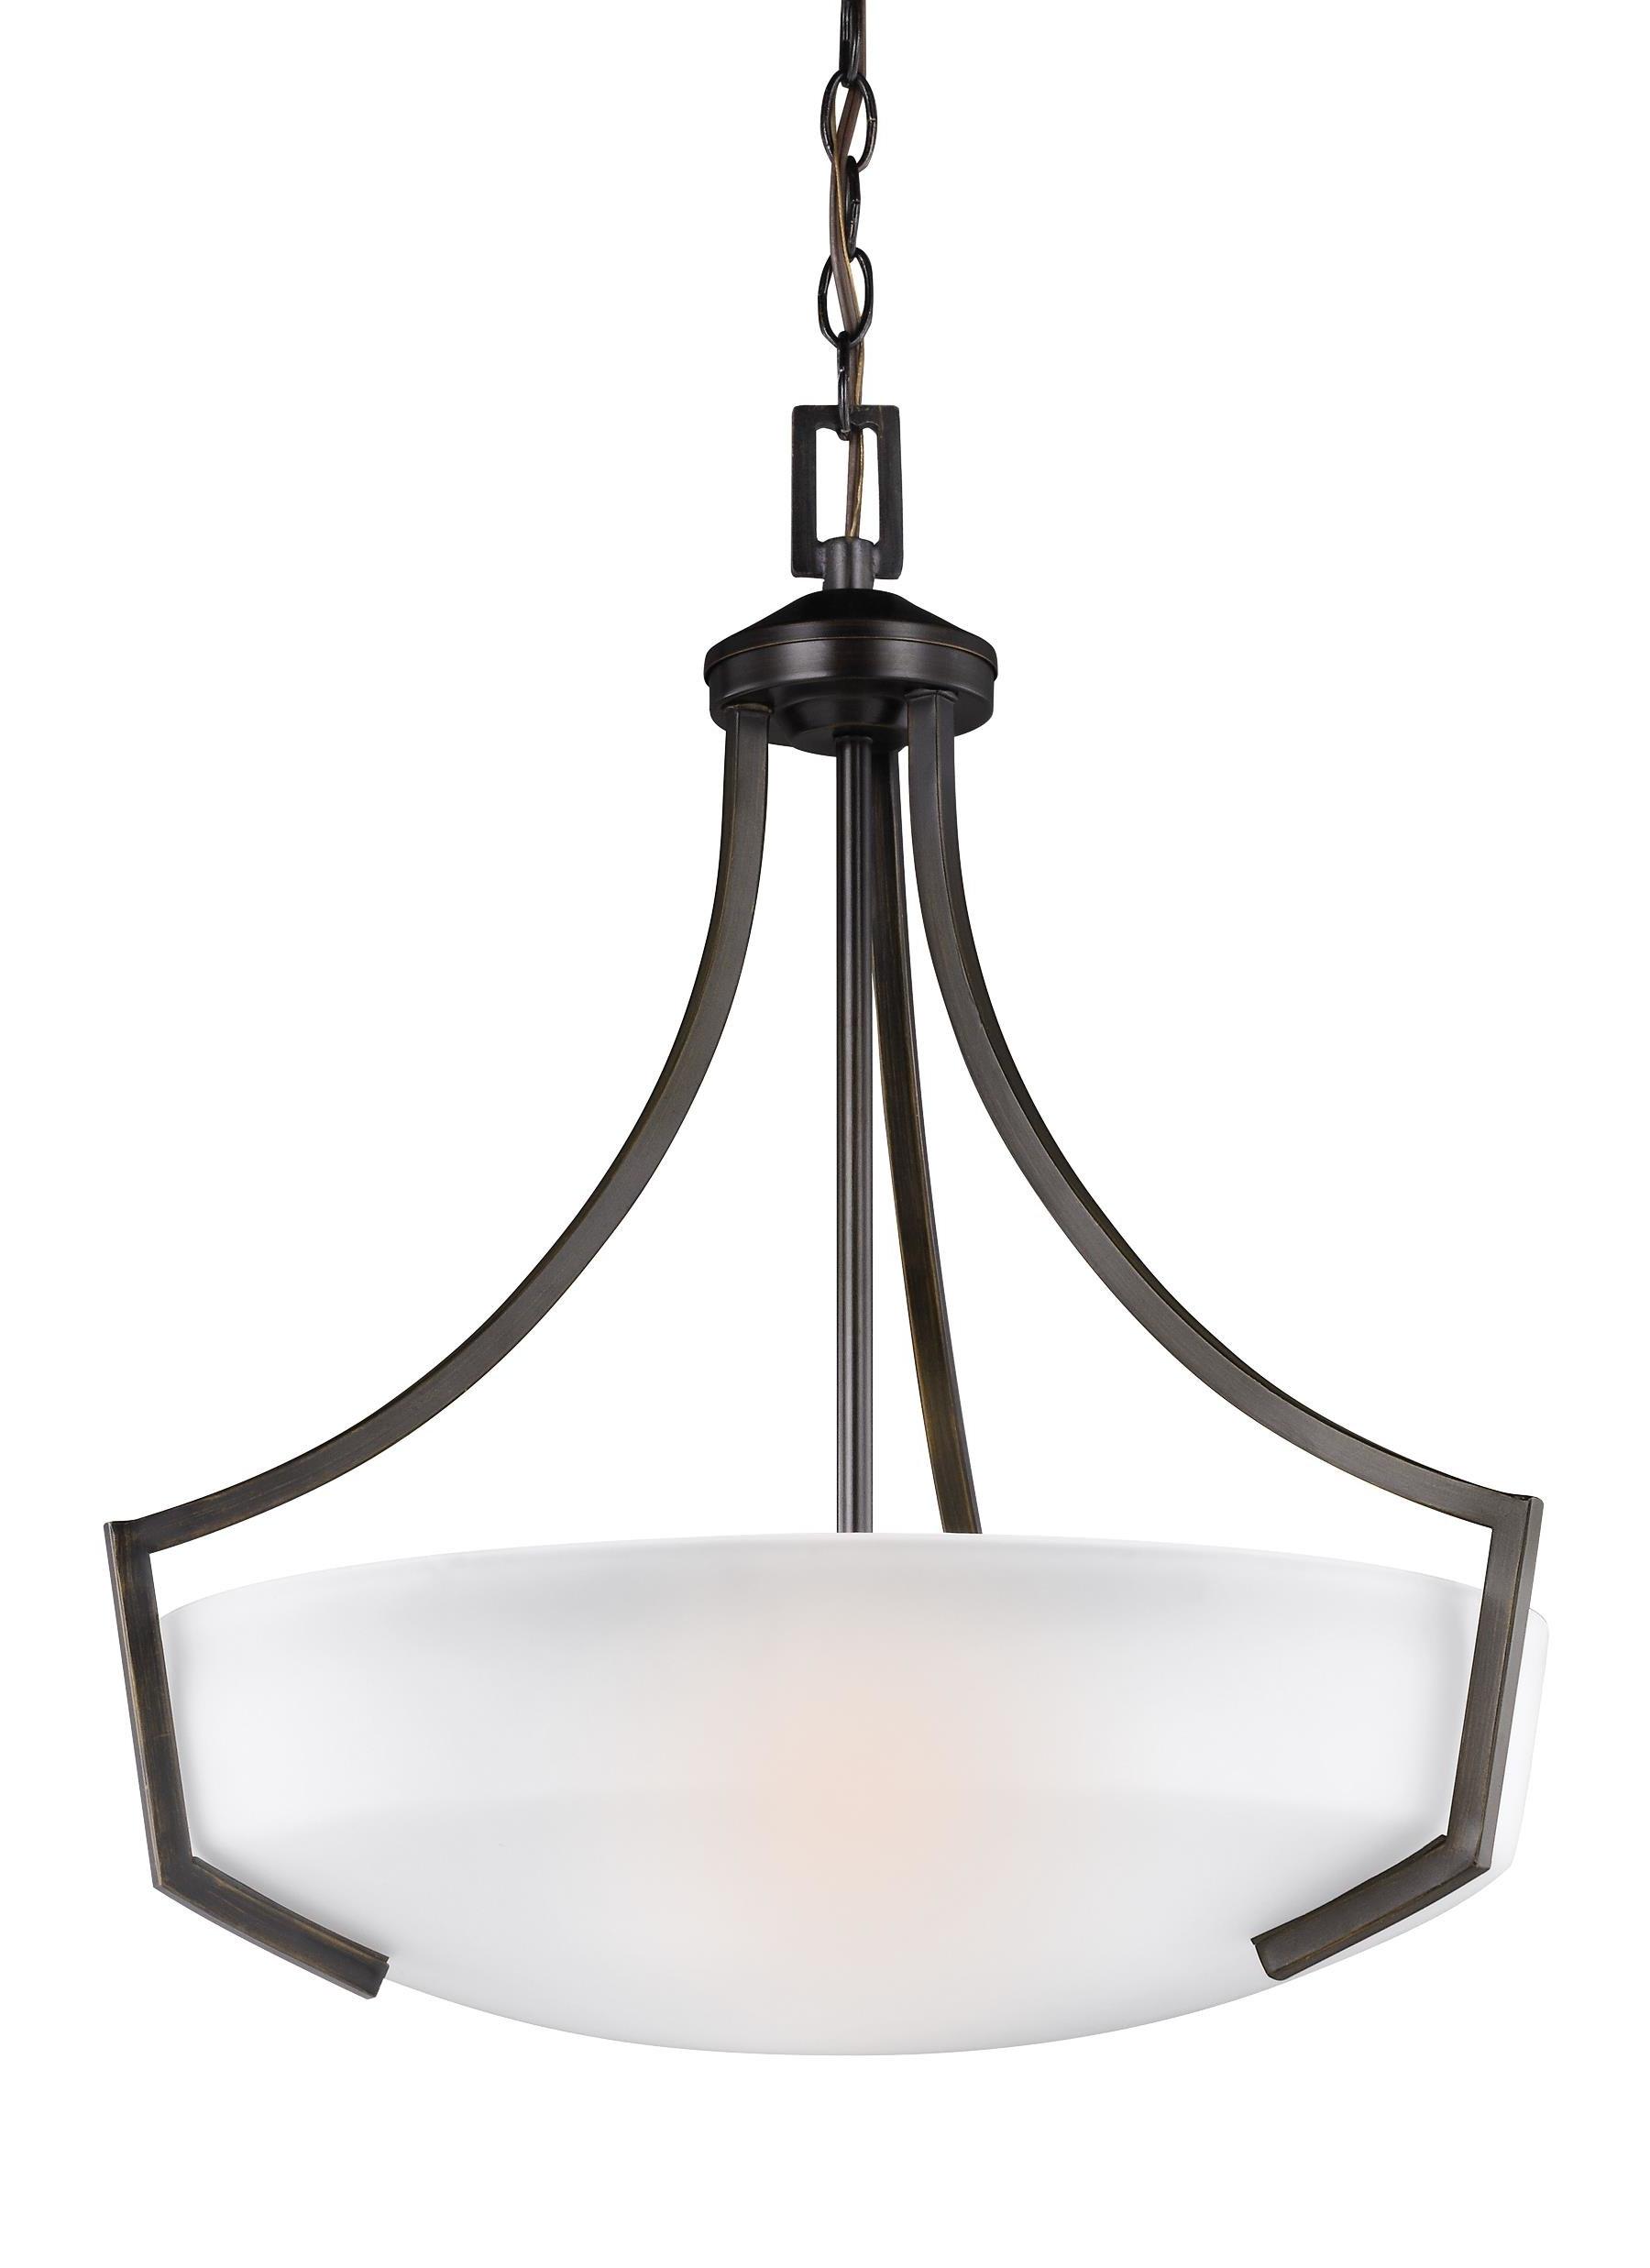 Elkton 3-Light Bowl Pendant regarding Well-liked Newent 3-Light Single Bowl Pendants